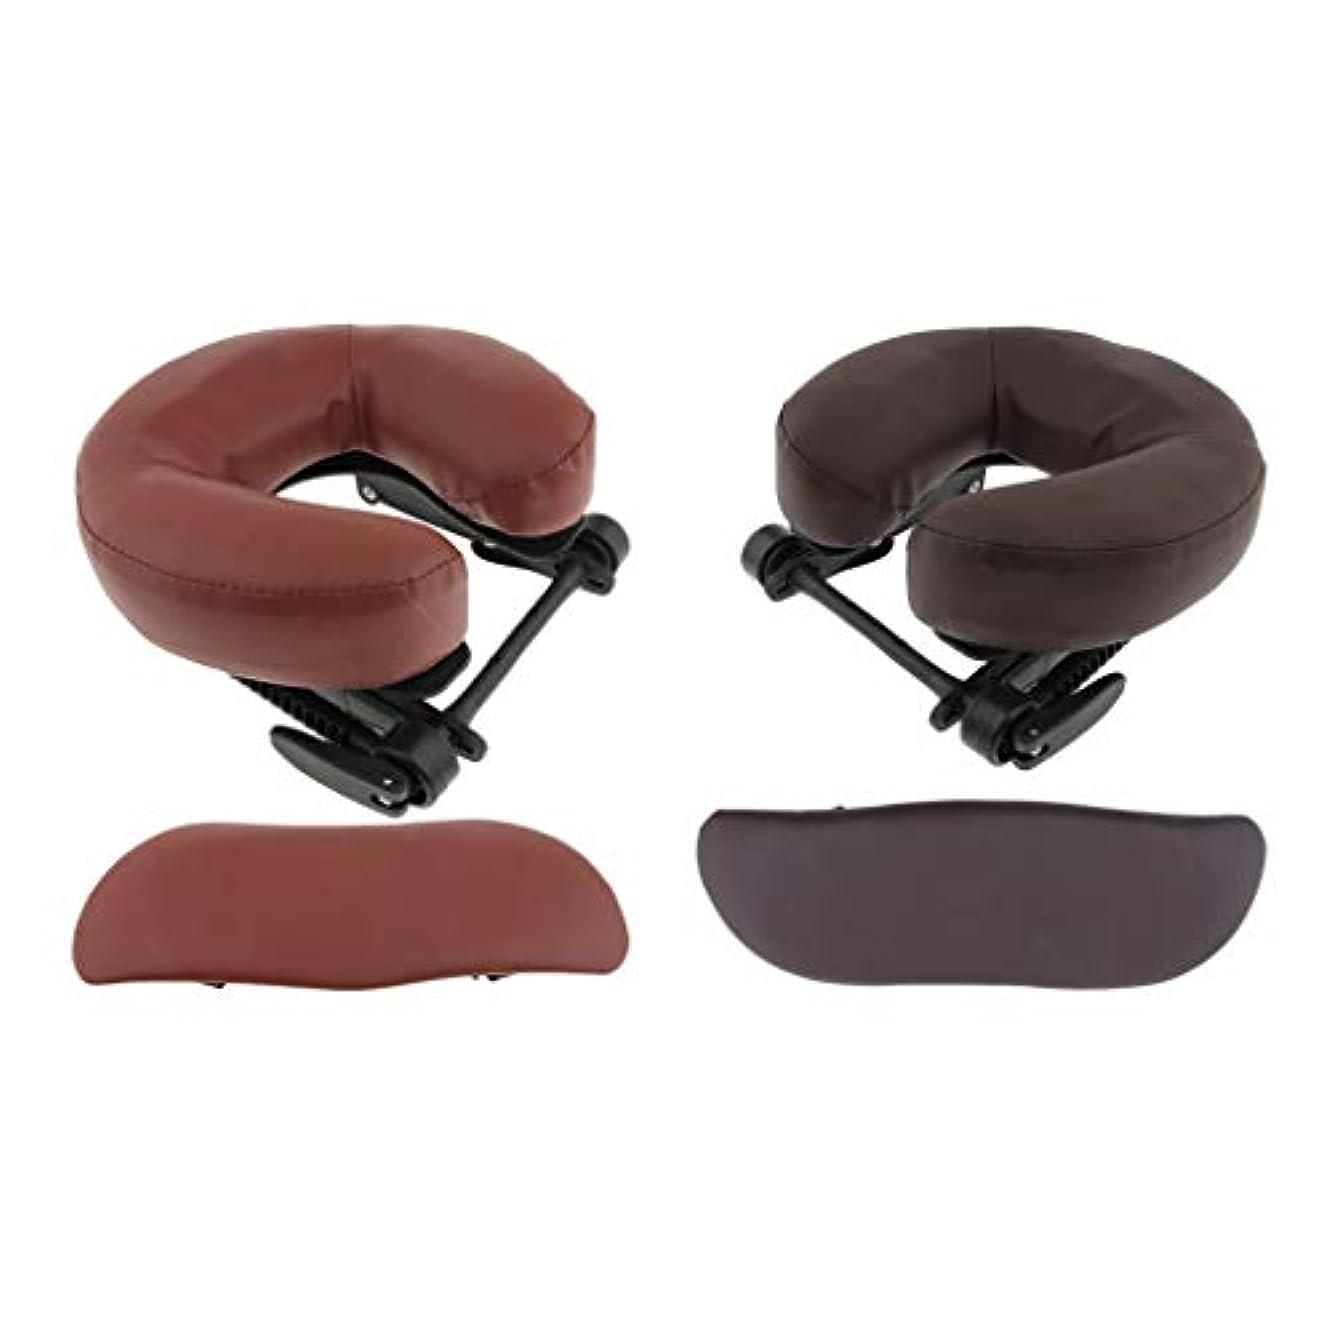 sharprepublic マッサージ テーブル 枕クッション U字型 完璧な アクセサリー 実用性